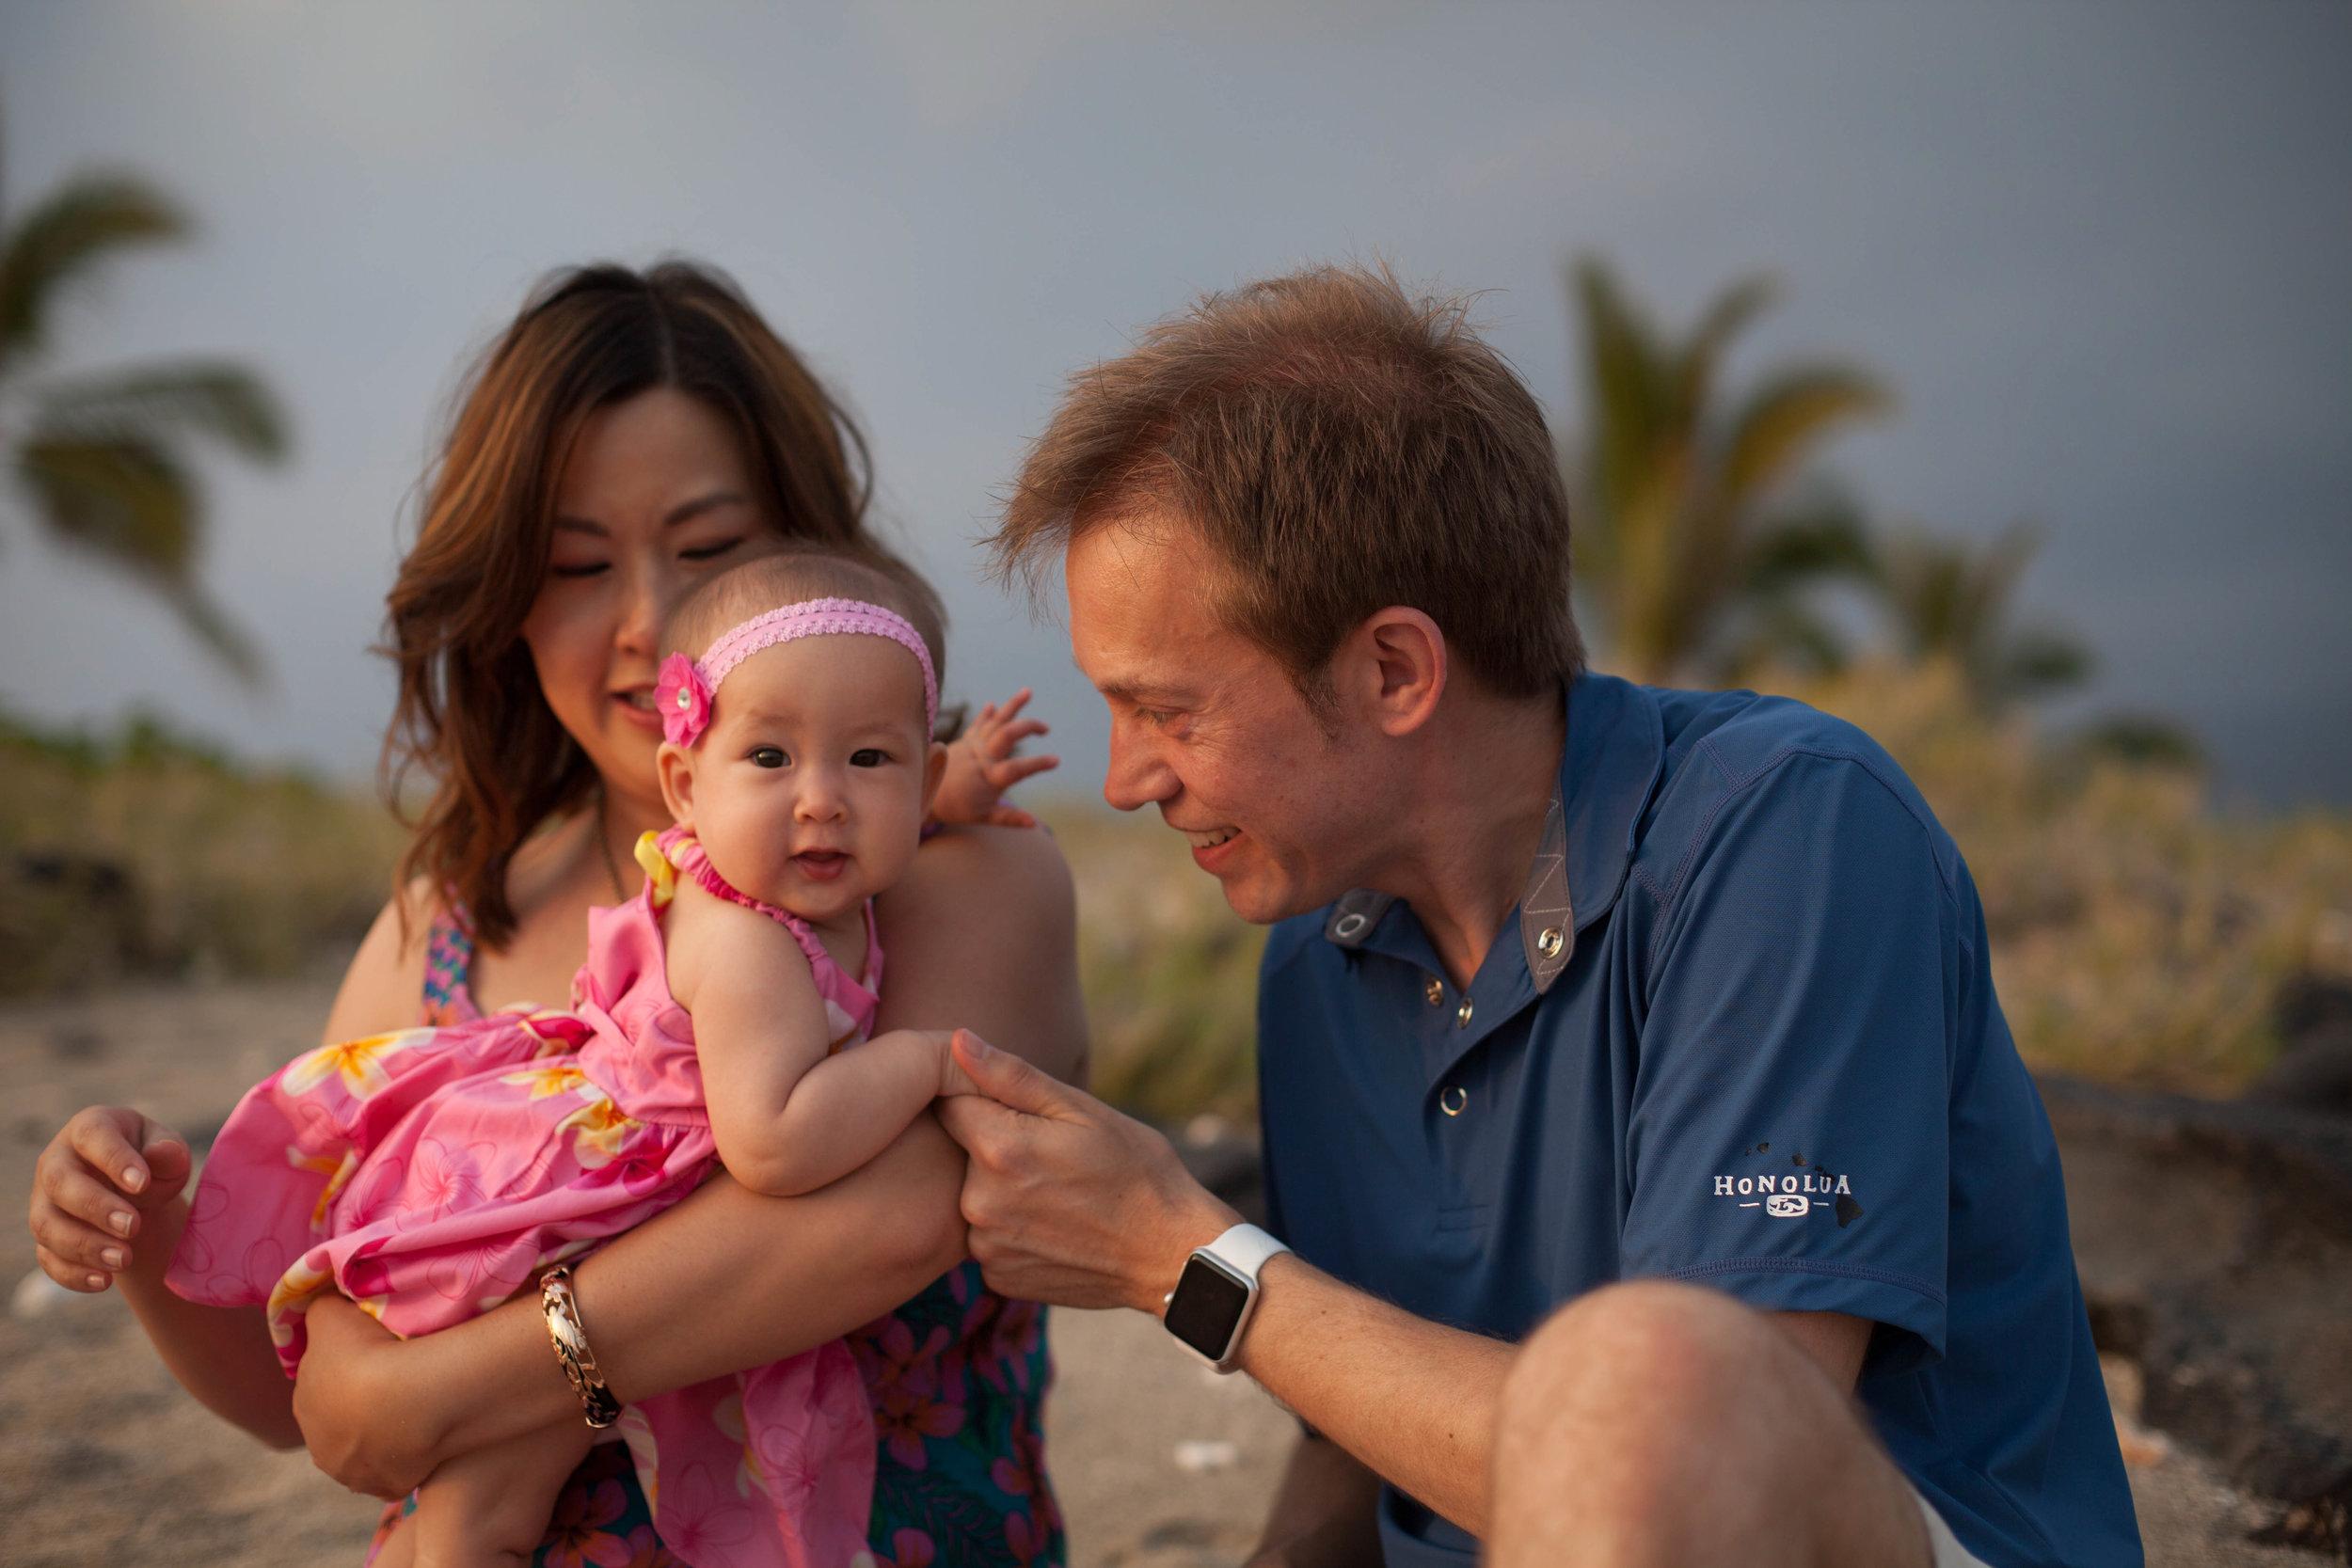 big island hawaii old kona airport beach family © kelilina photography 20170405180439.jpg